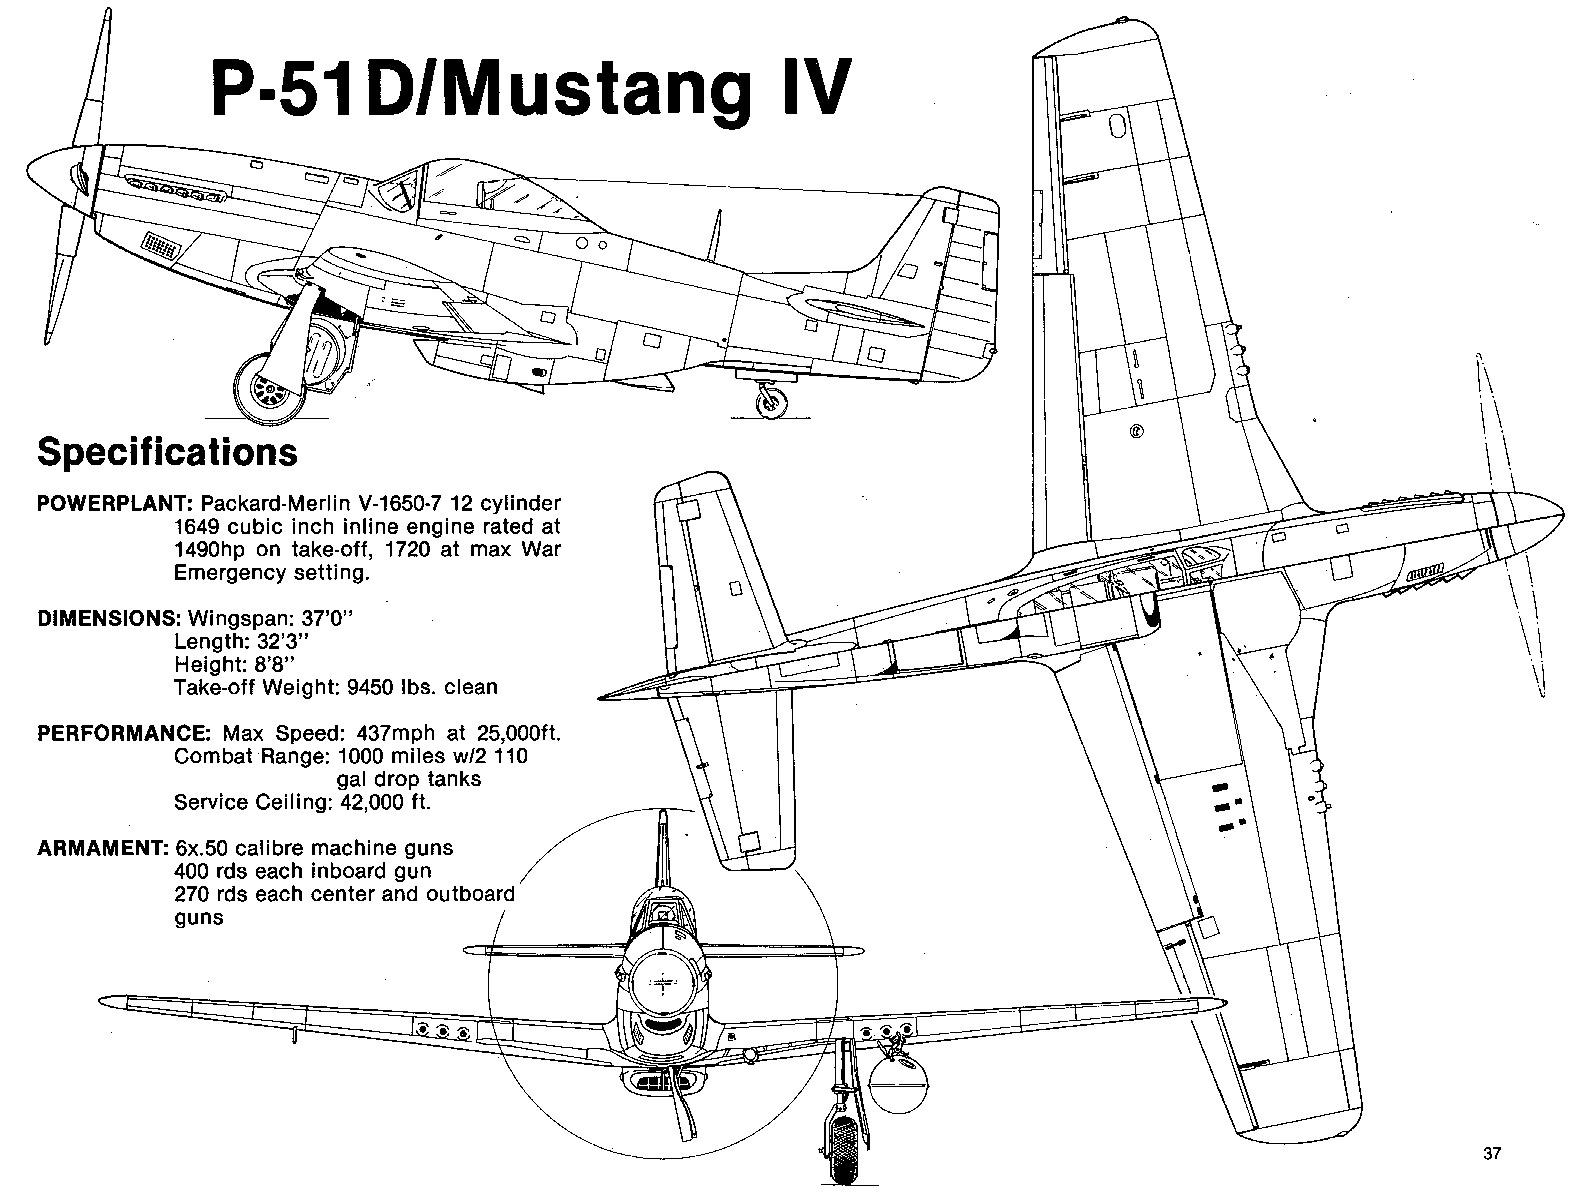 Чертеж истребителя P-51 'Мустанг'